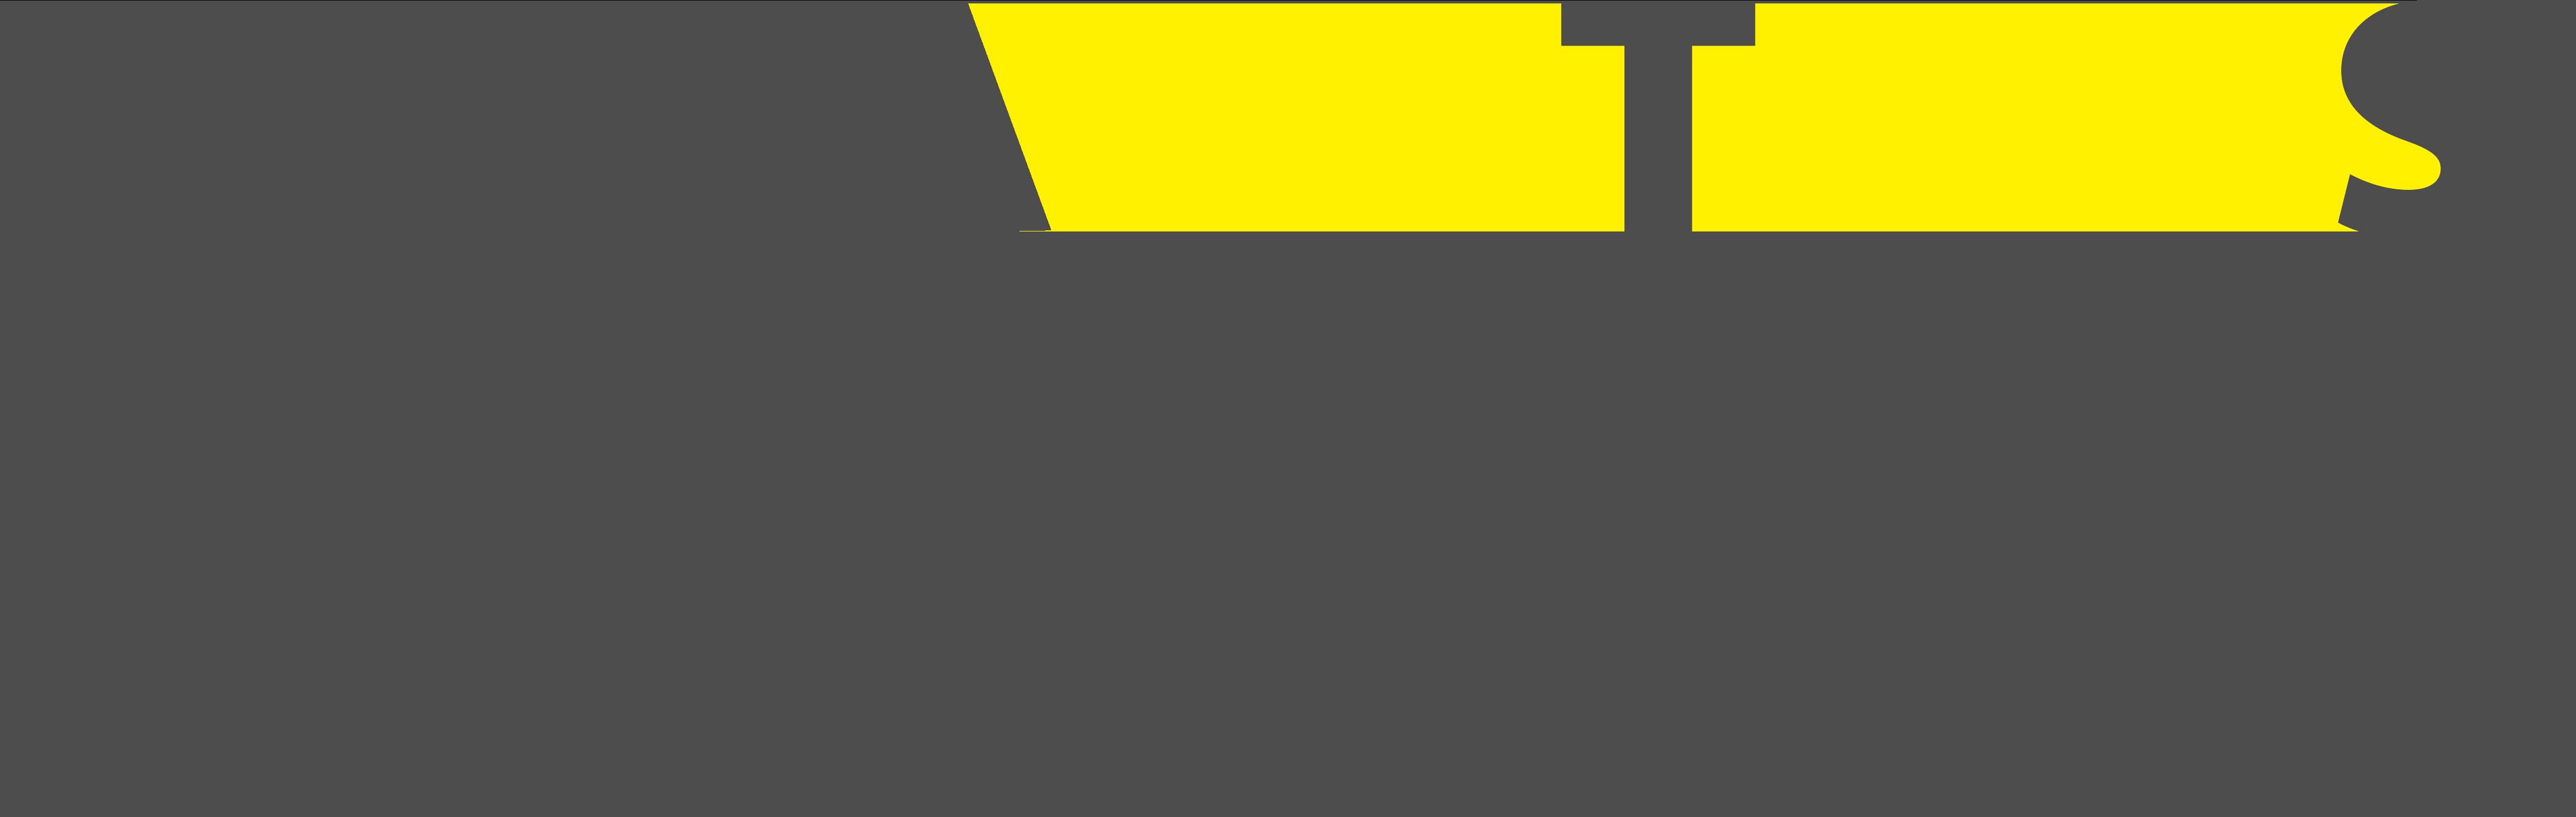 Logo ATS Rauw PGmbH